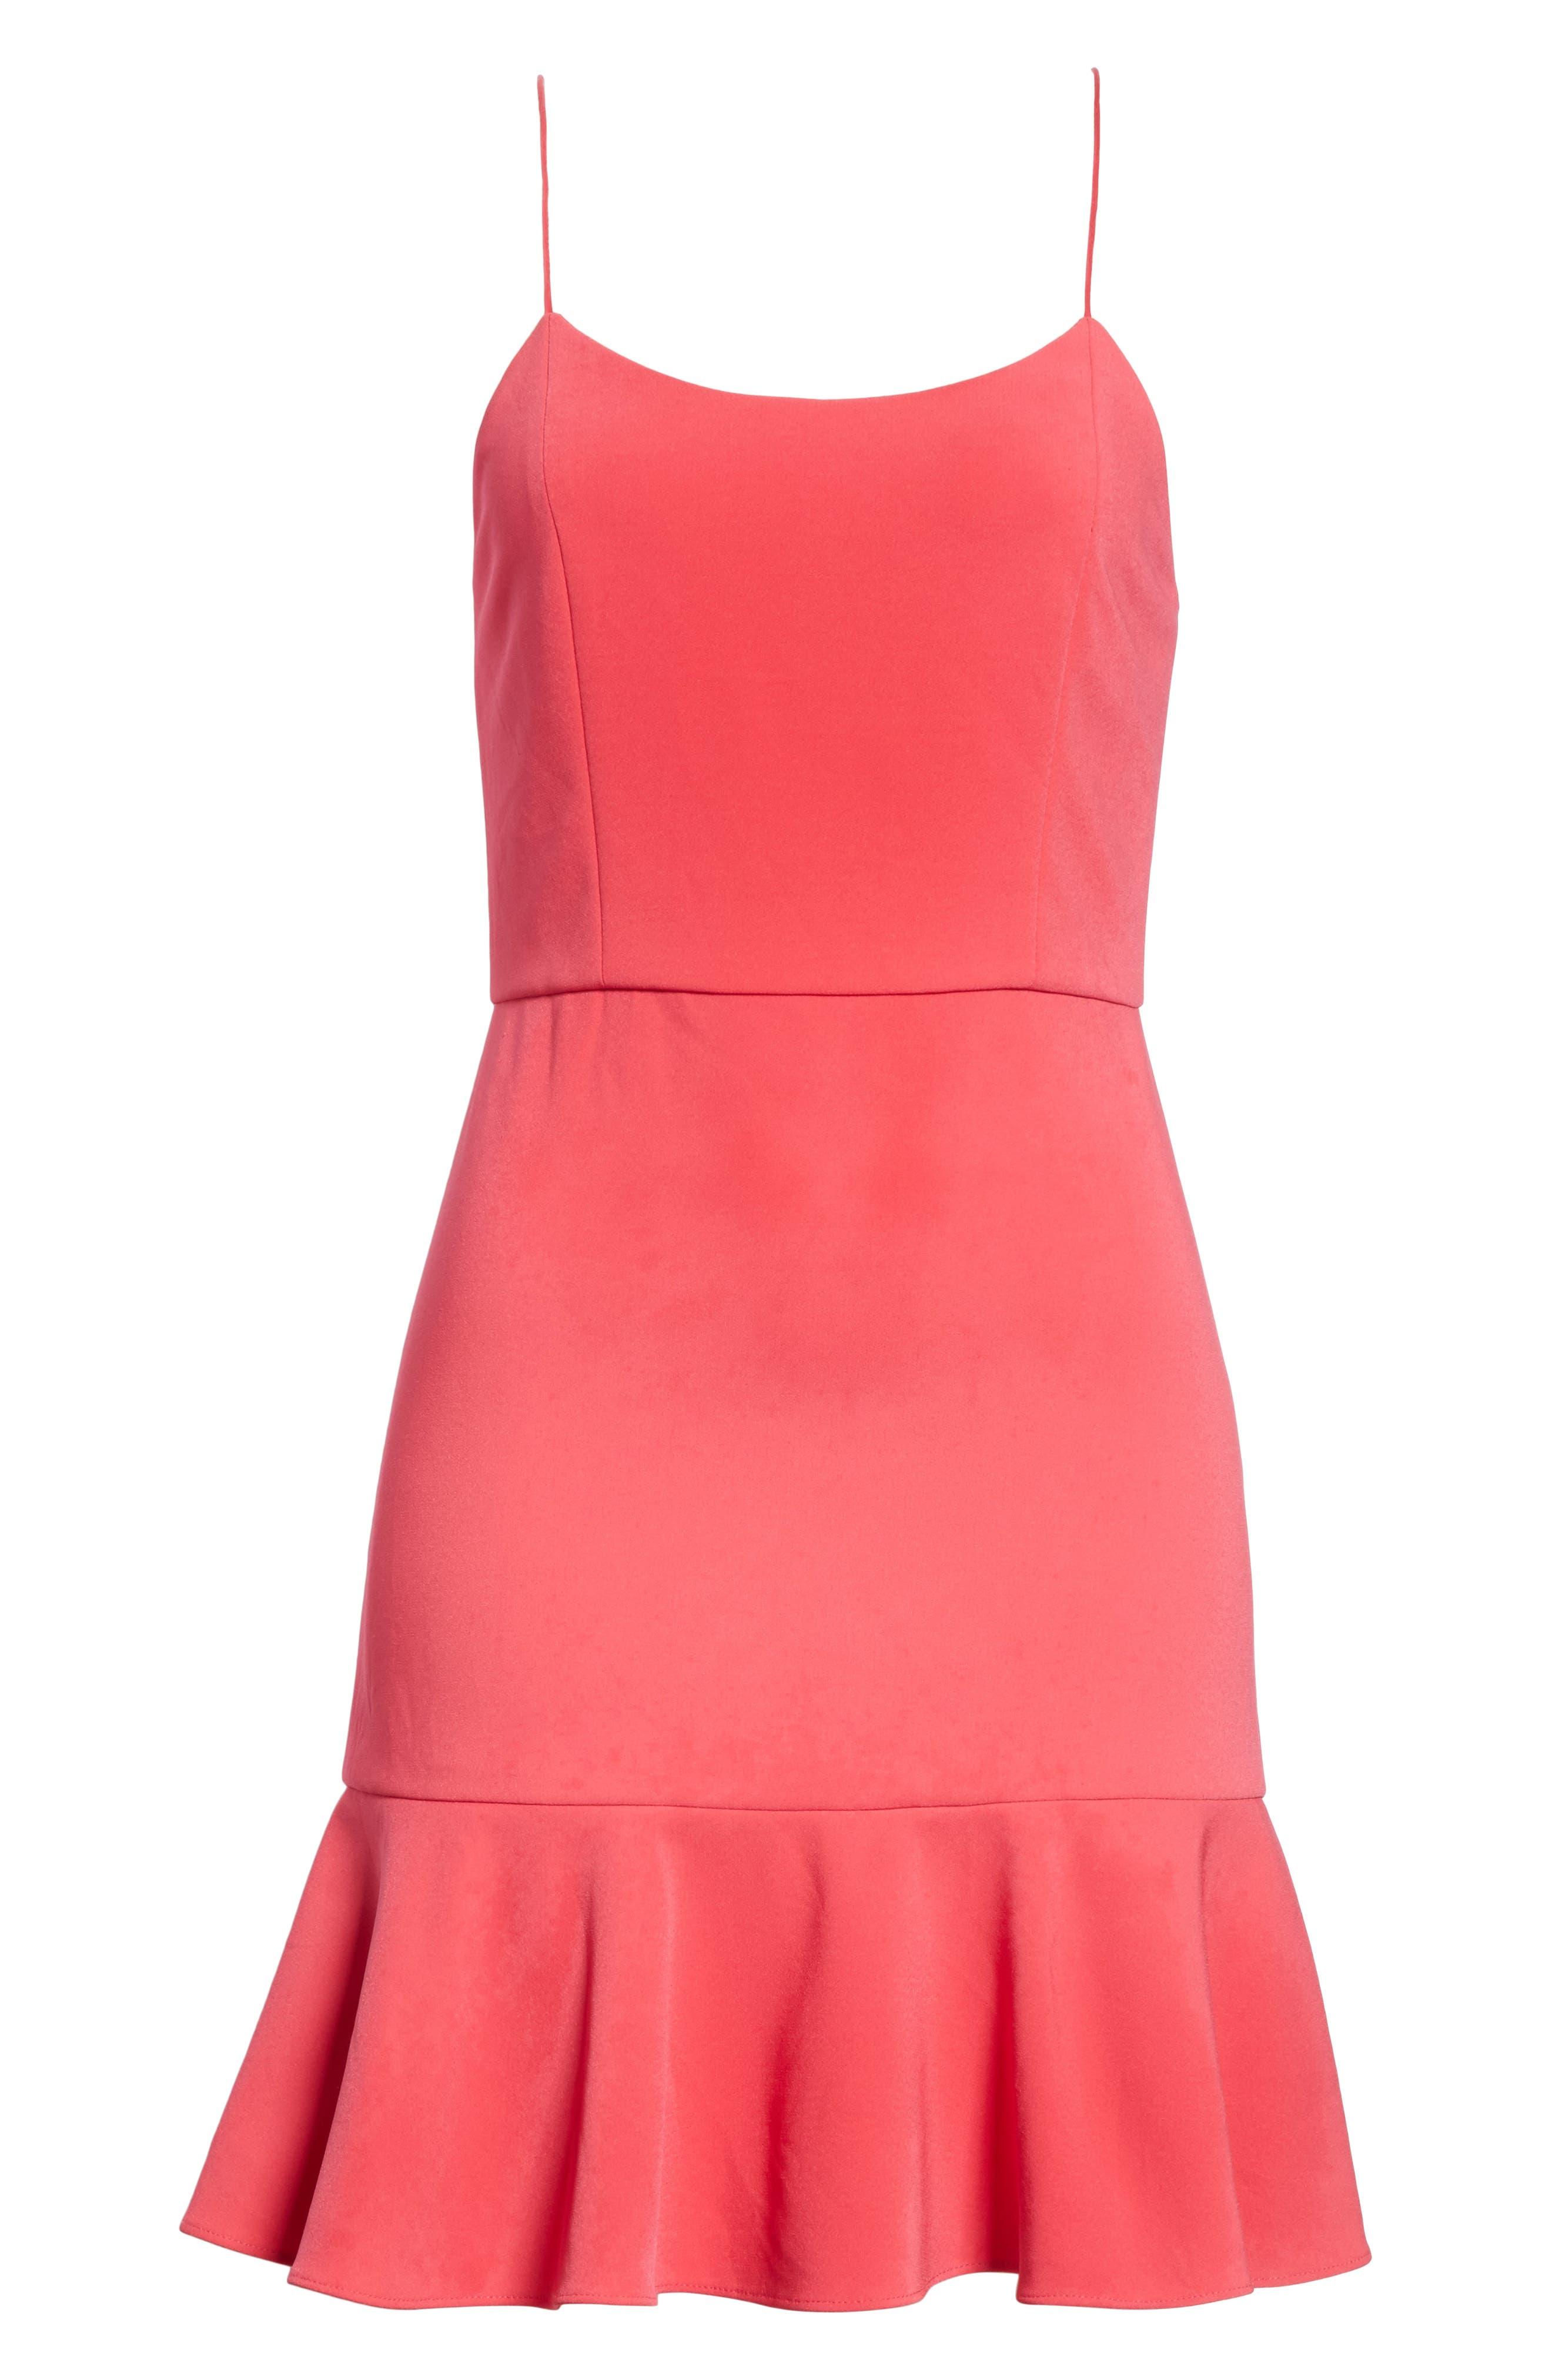 Andalasia Sleeveless Fit & Flare Dress,                             Alternate thumbnail 6, color,